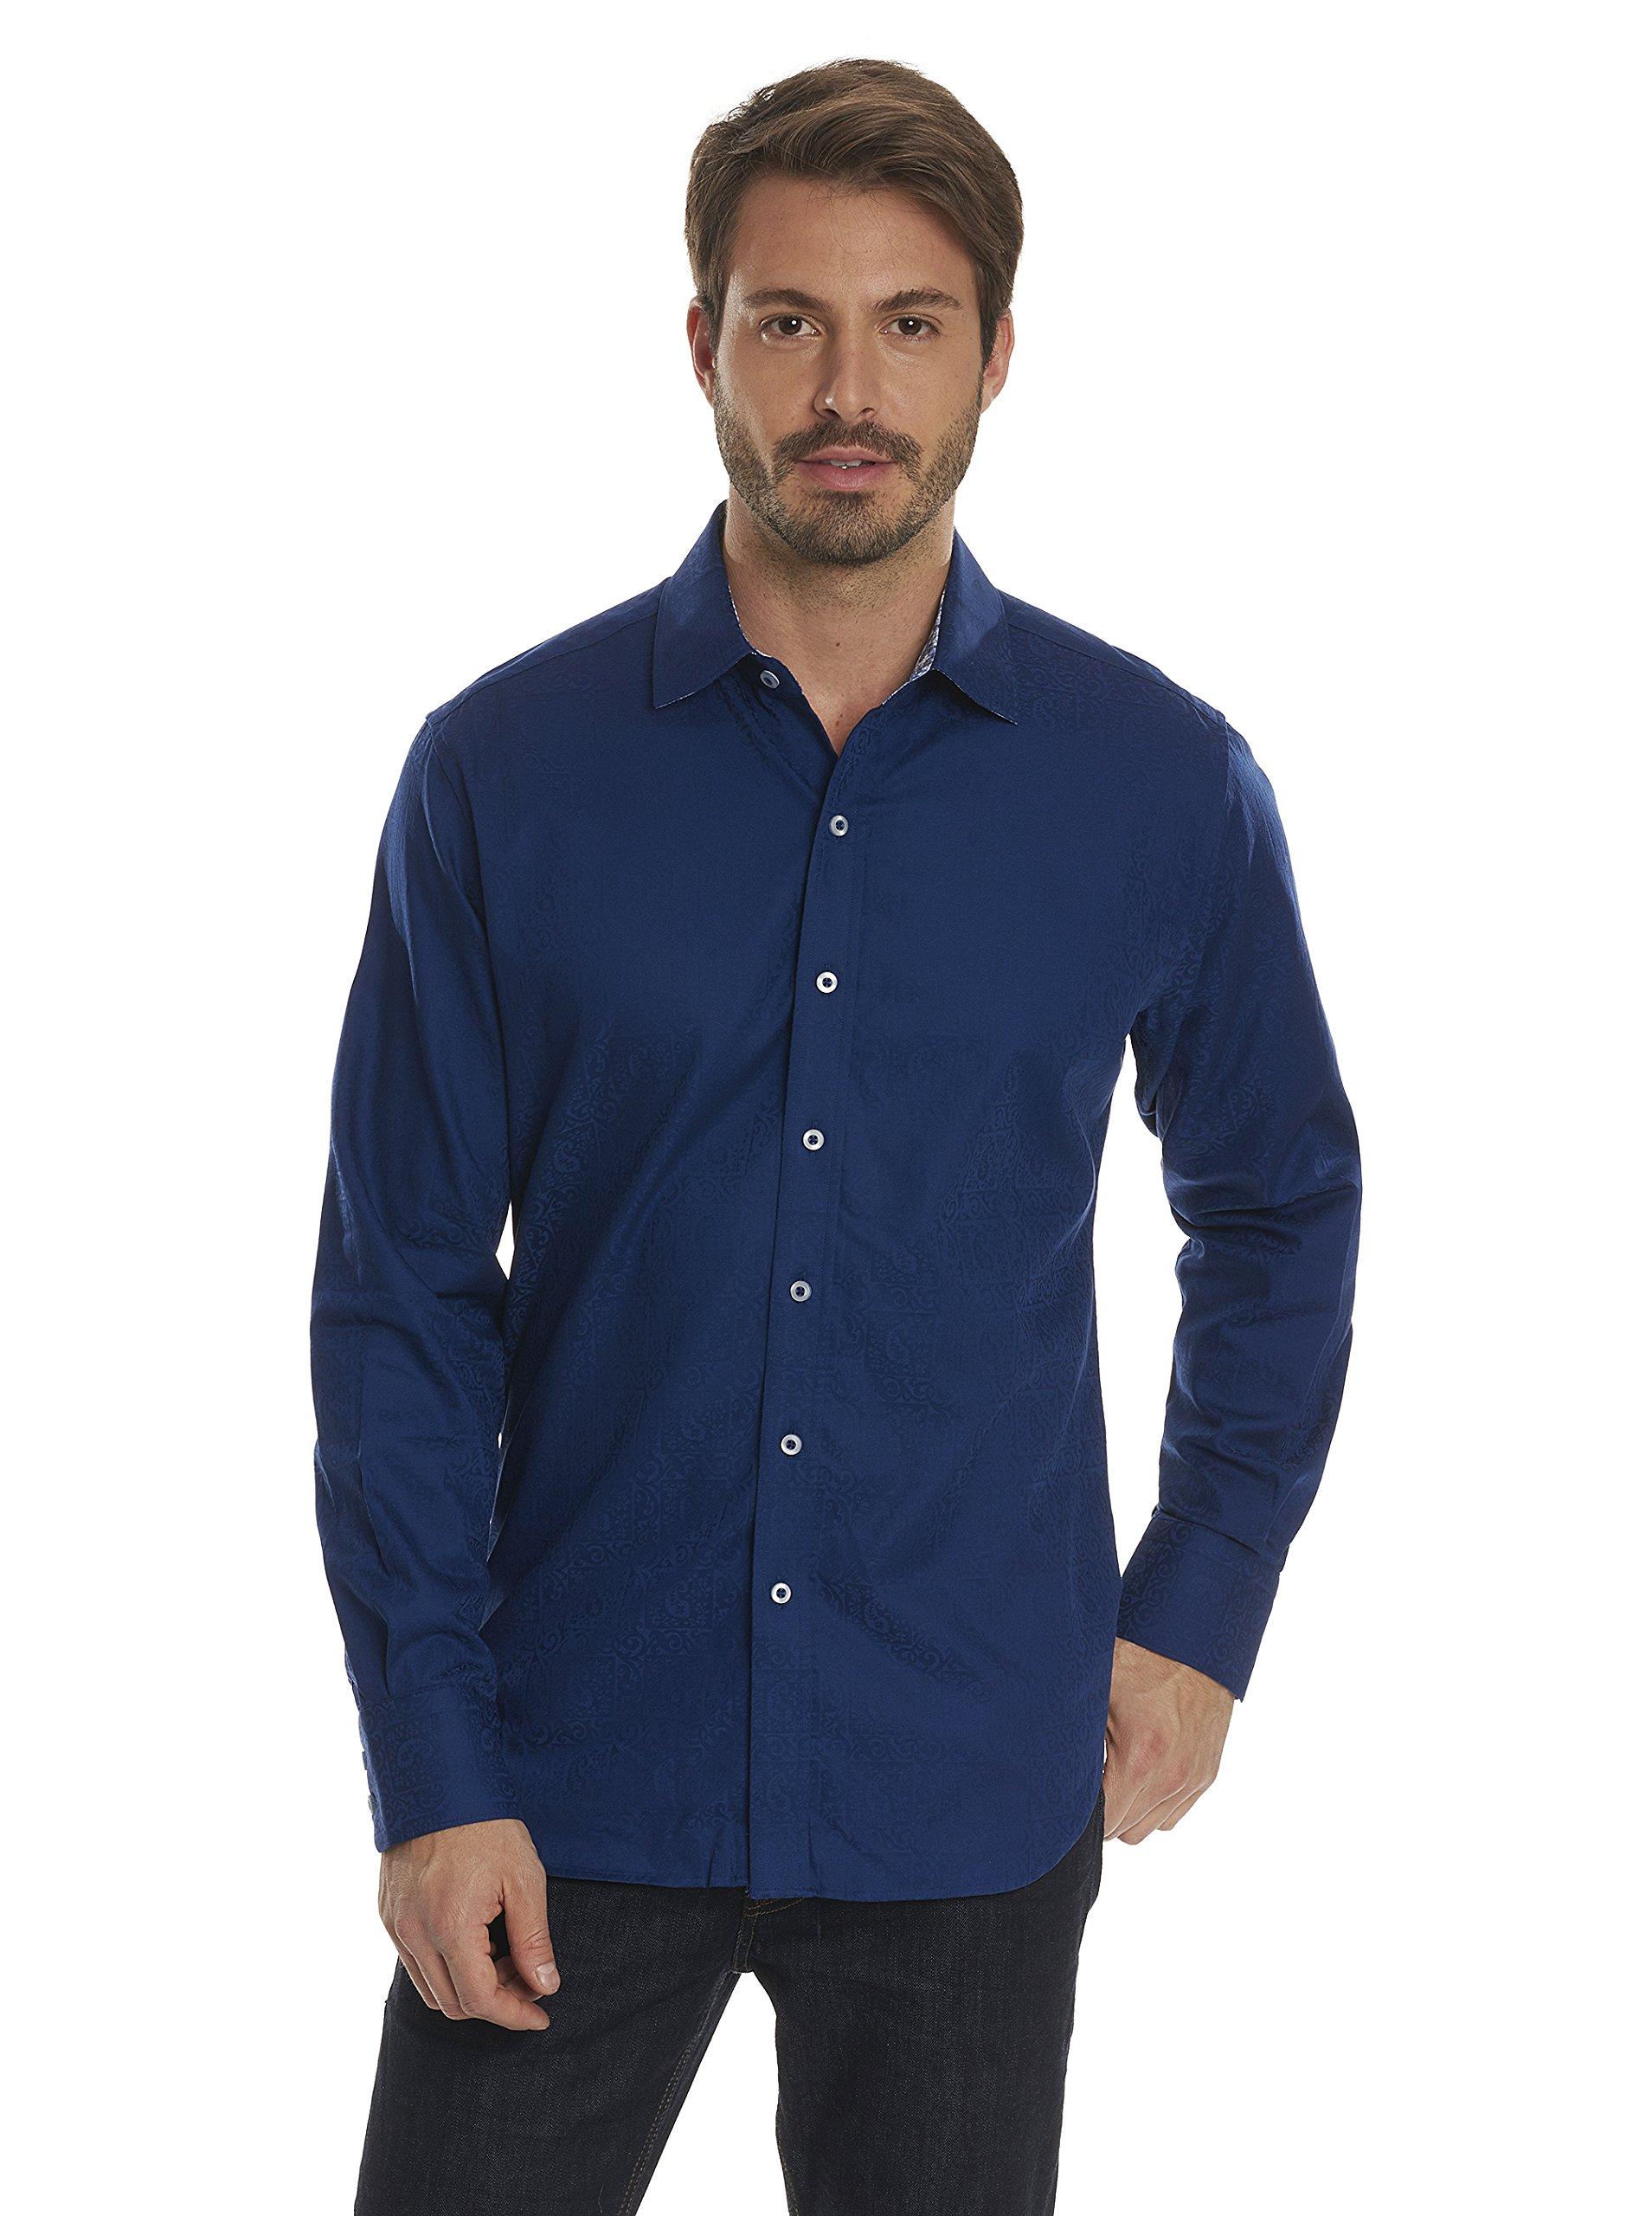 Robert Graham Men's Windsor Classic Fit Long Sleeve Shirt, Navy, 2XLARGE by Robert Graham